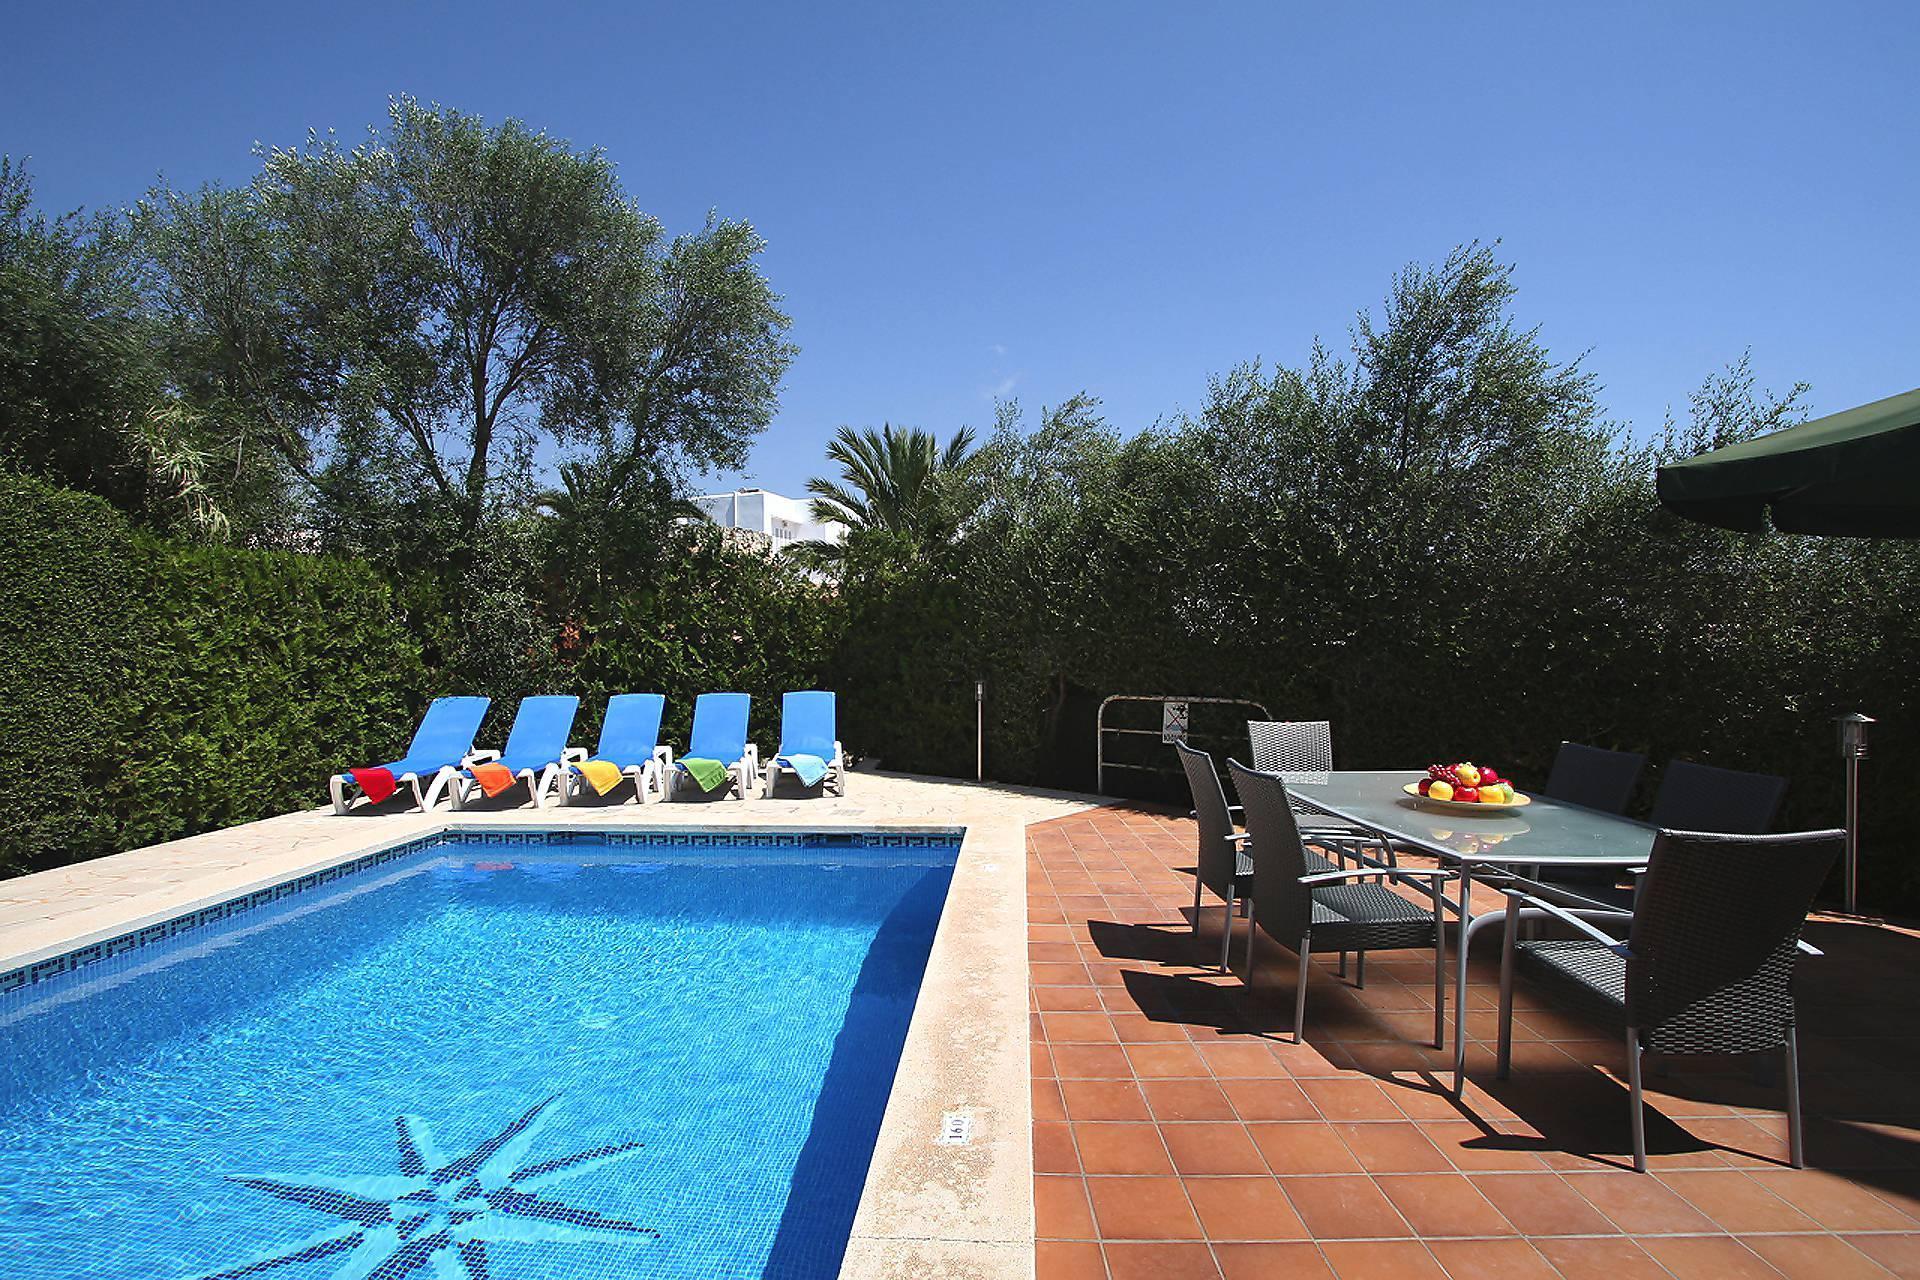 01-128 Rustic holiday home Majorca East Bild 4